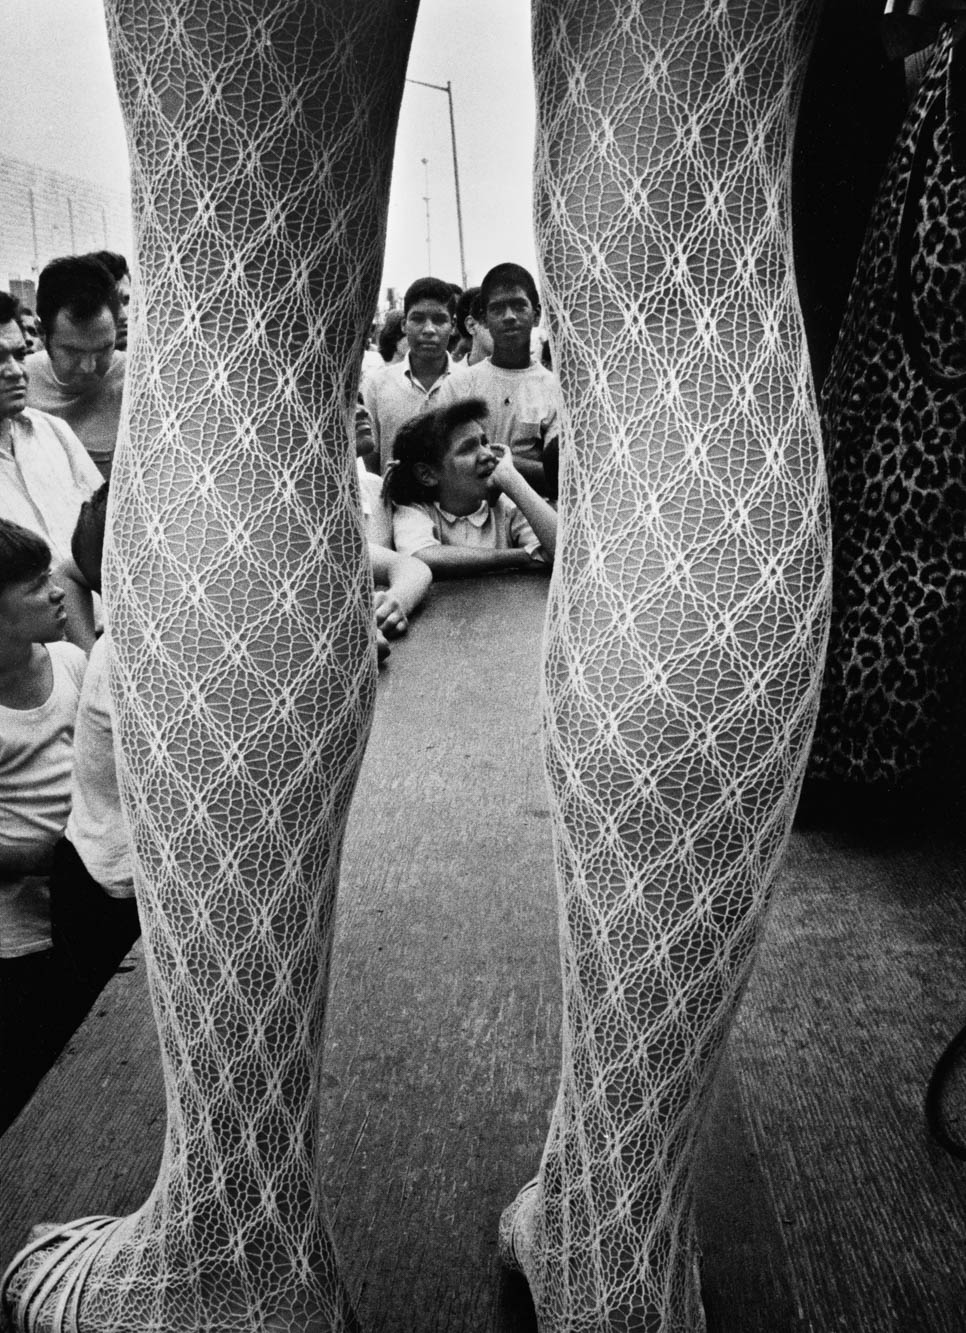 Copy of Lacy Legs (Coney Island, New York), 1969